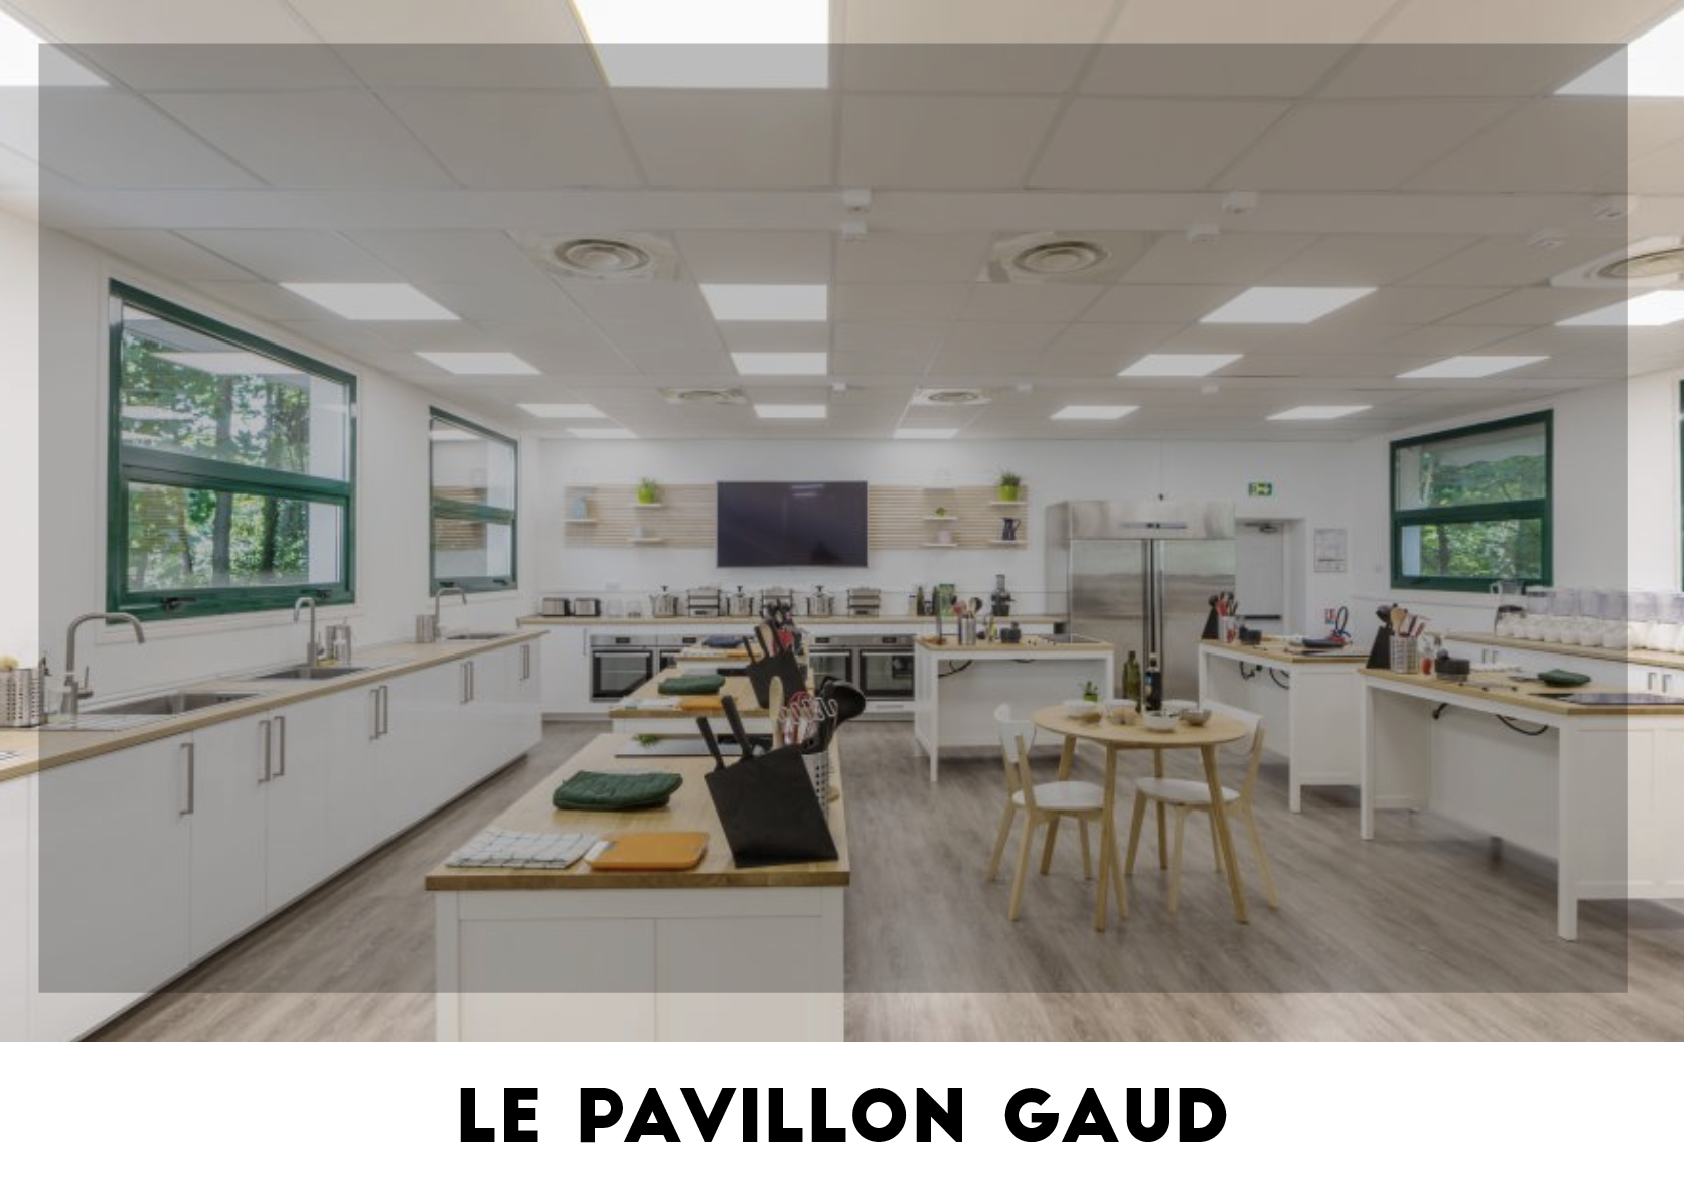 Pavillon Gaud